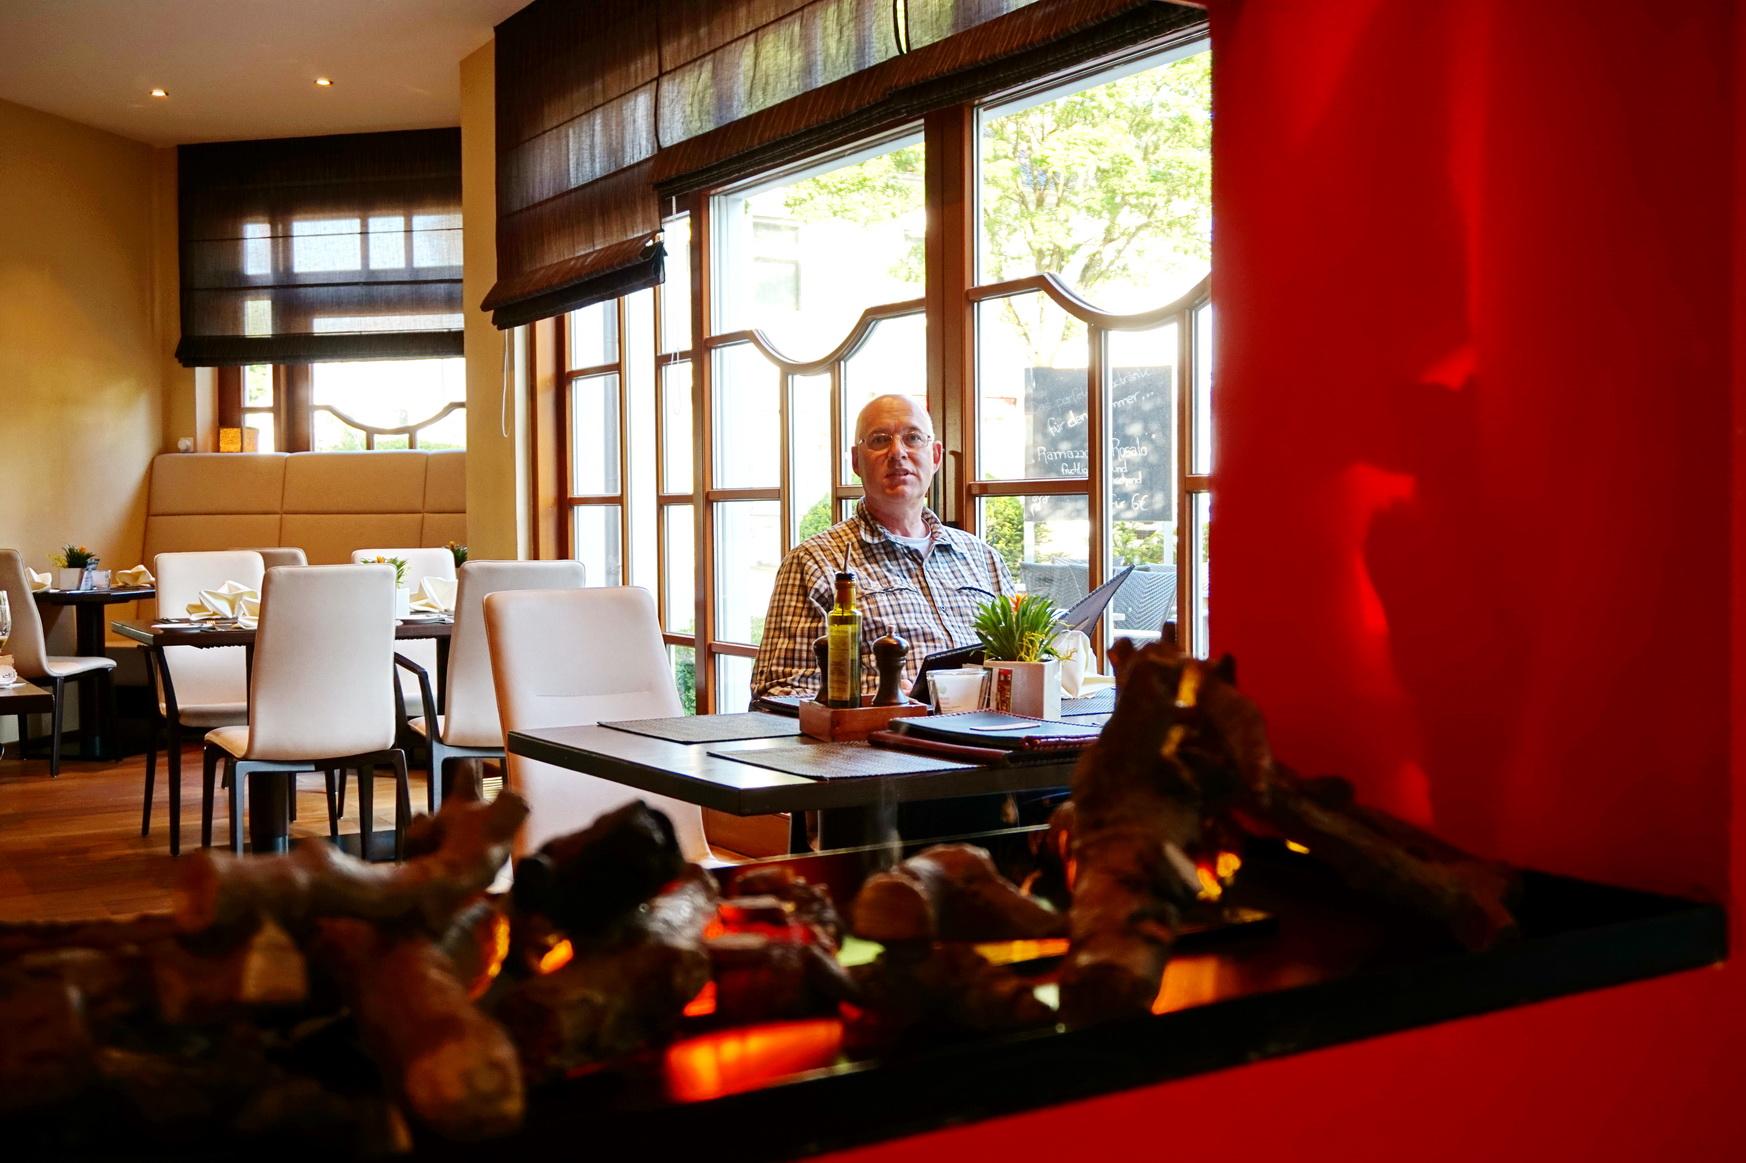 Restaurant Sunderland im Sunderland Hotel in Sundern im Sauerland